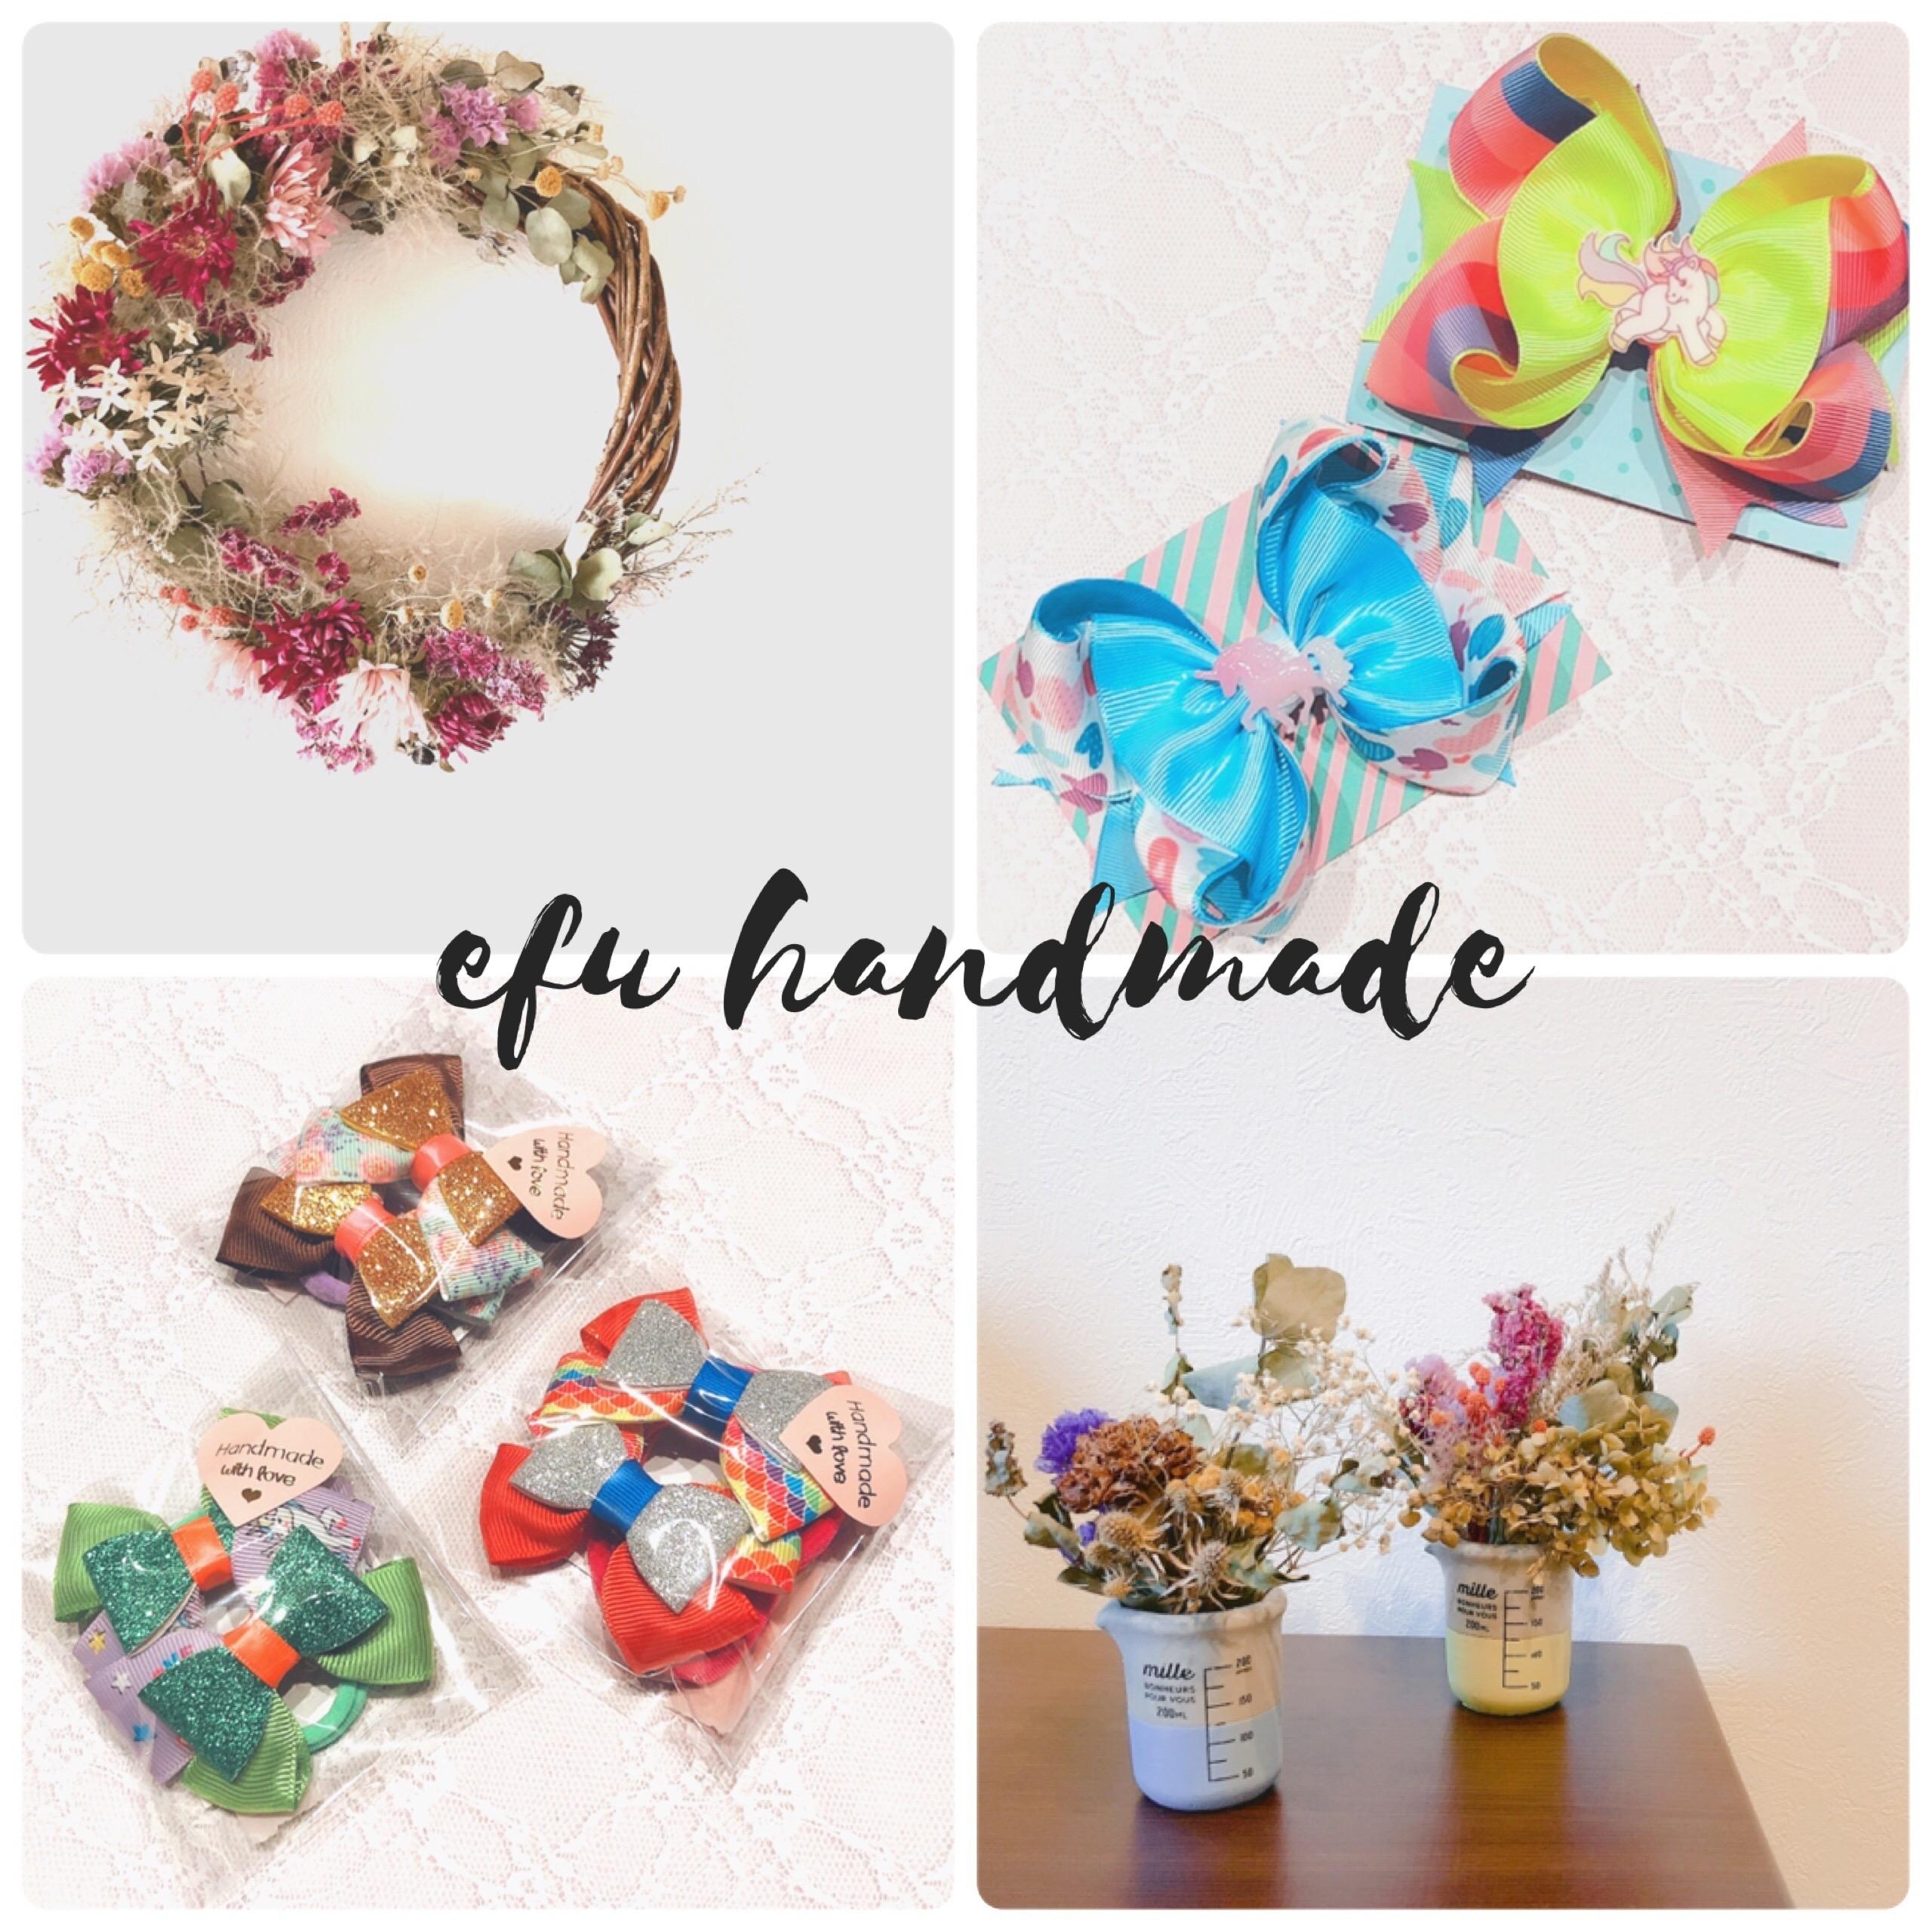 efu_handmade & naho*hanko